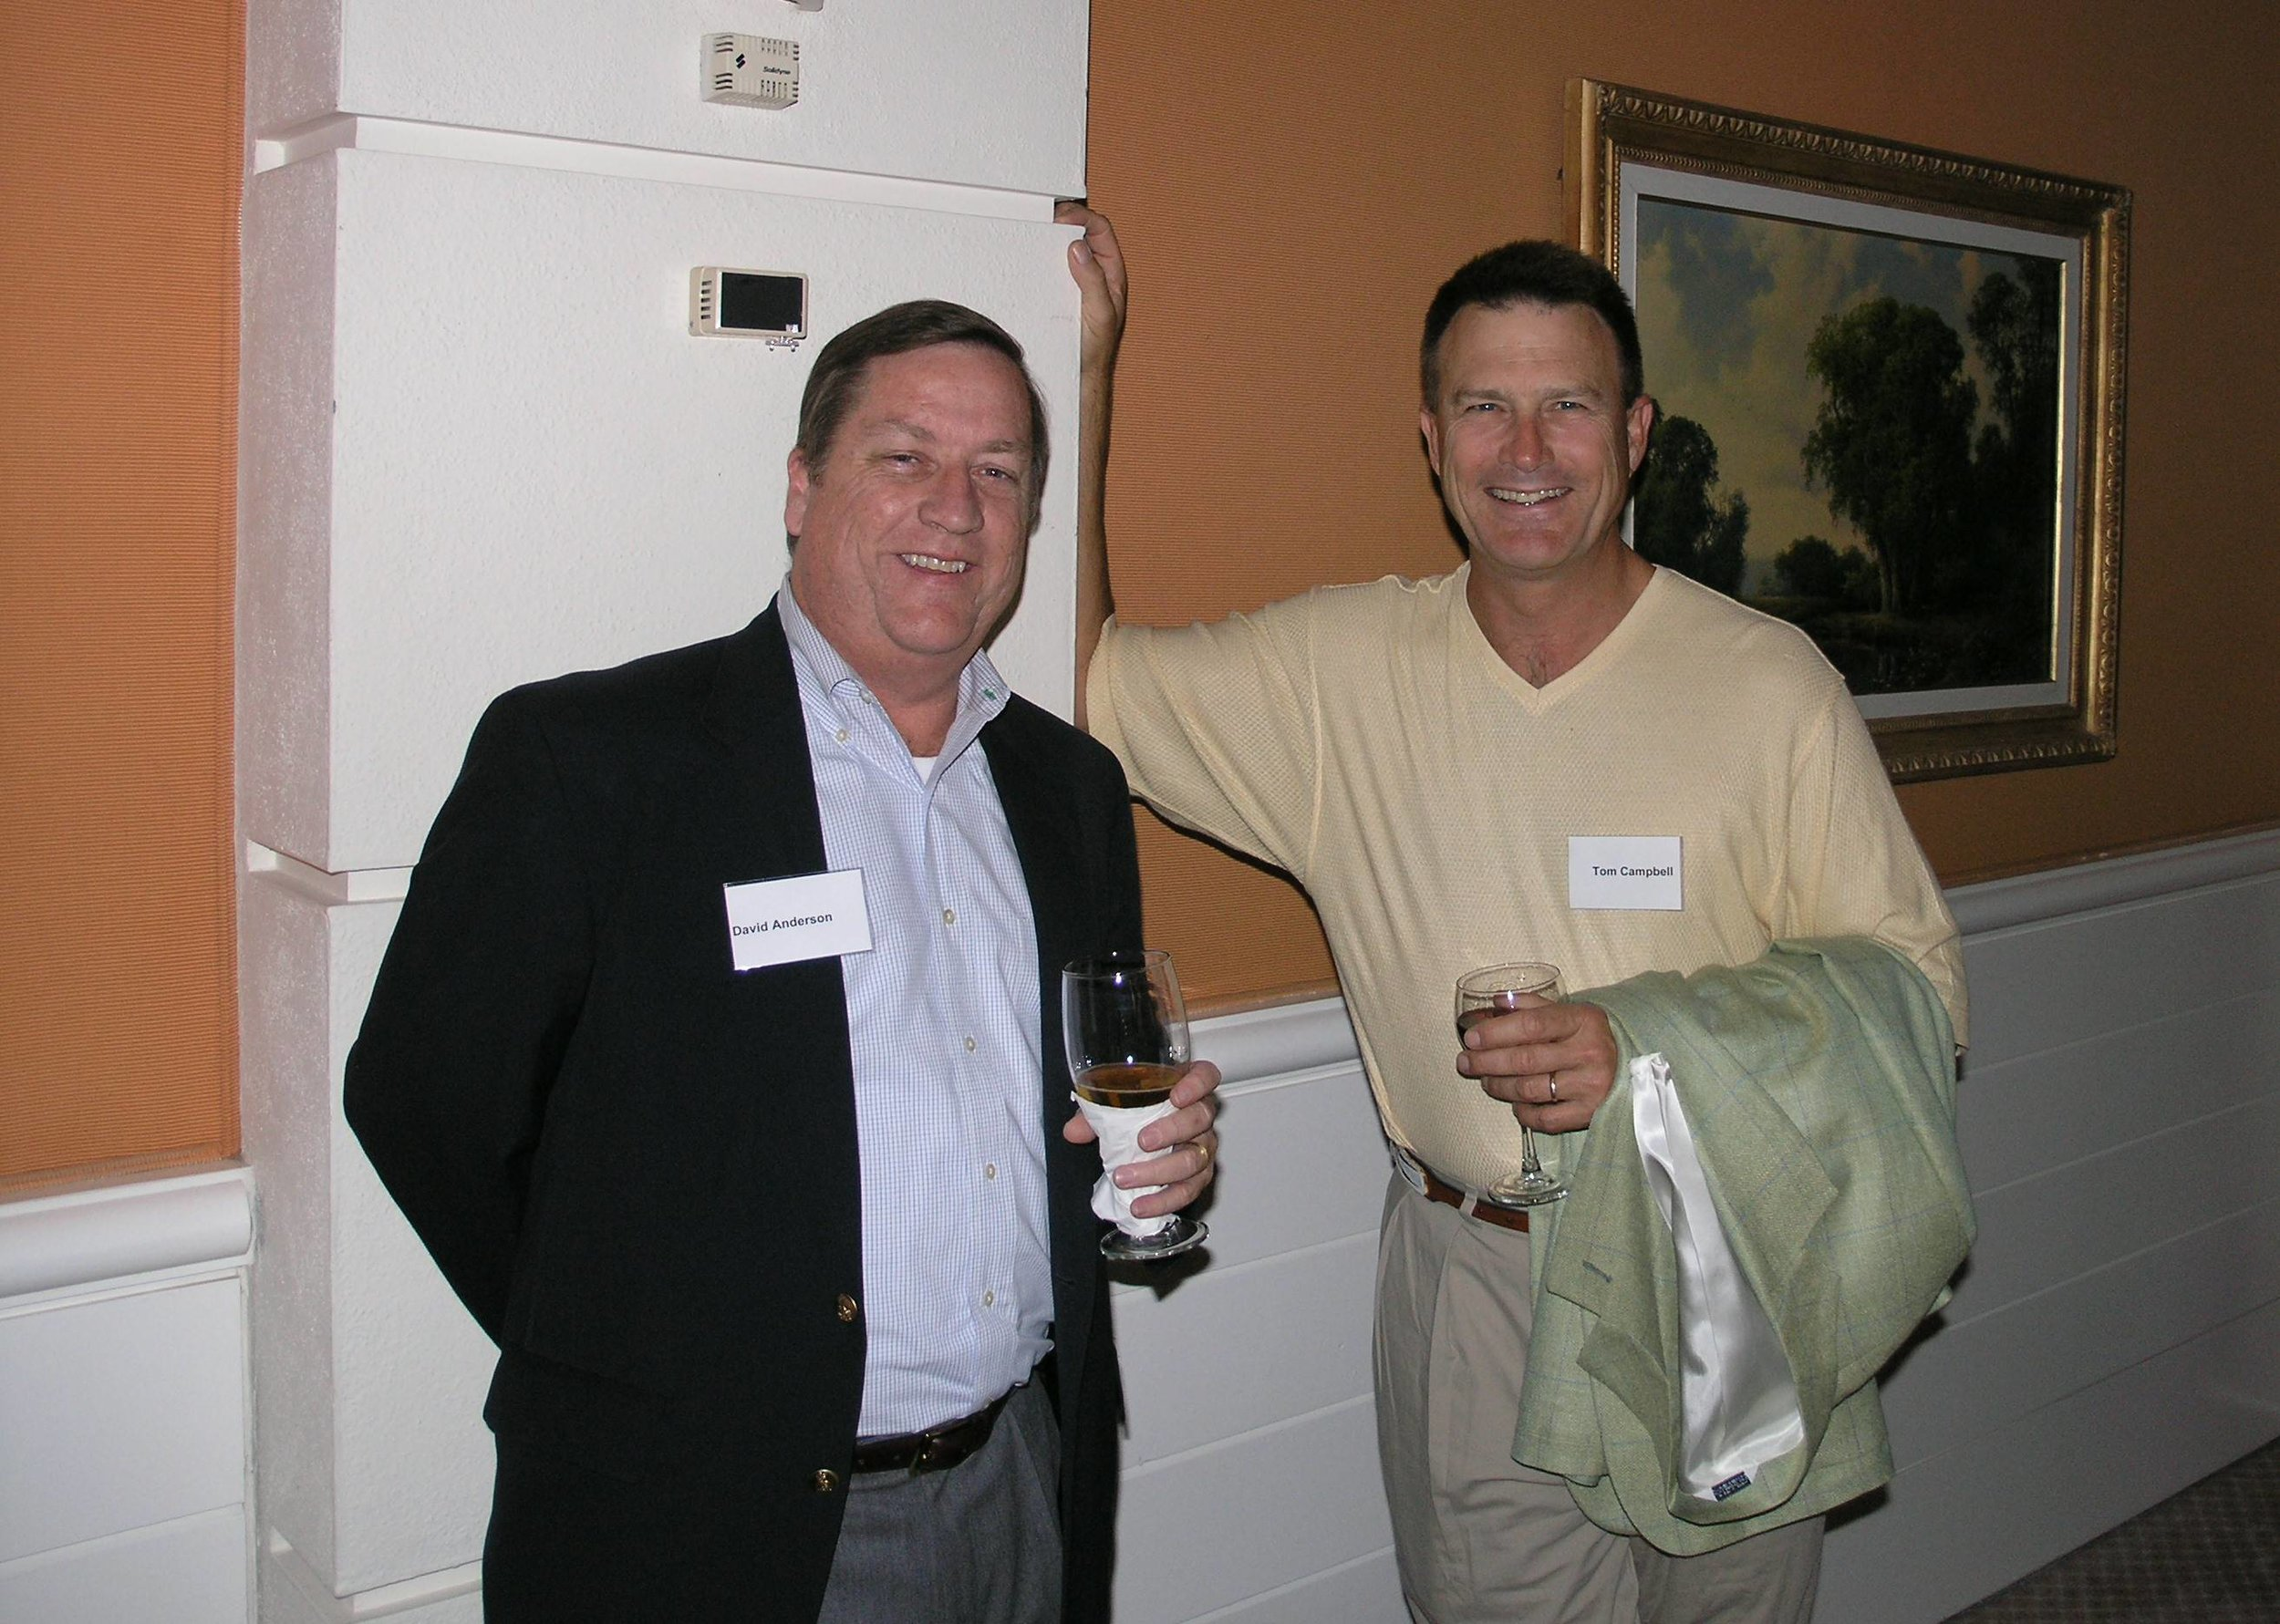 David Anderson, Tom Campbell